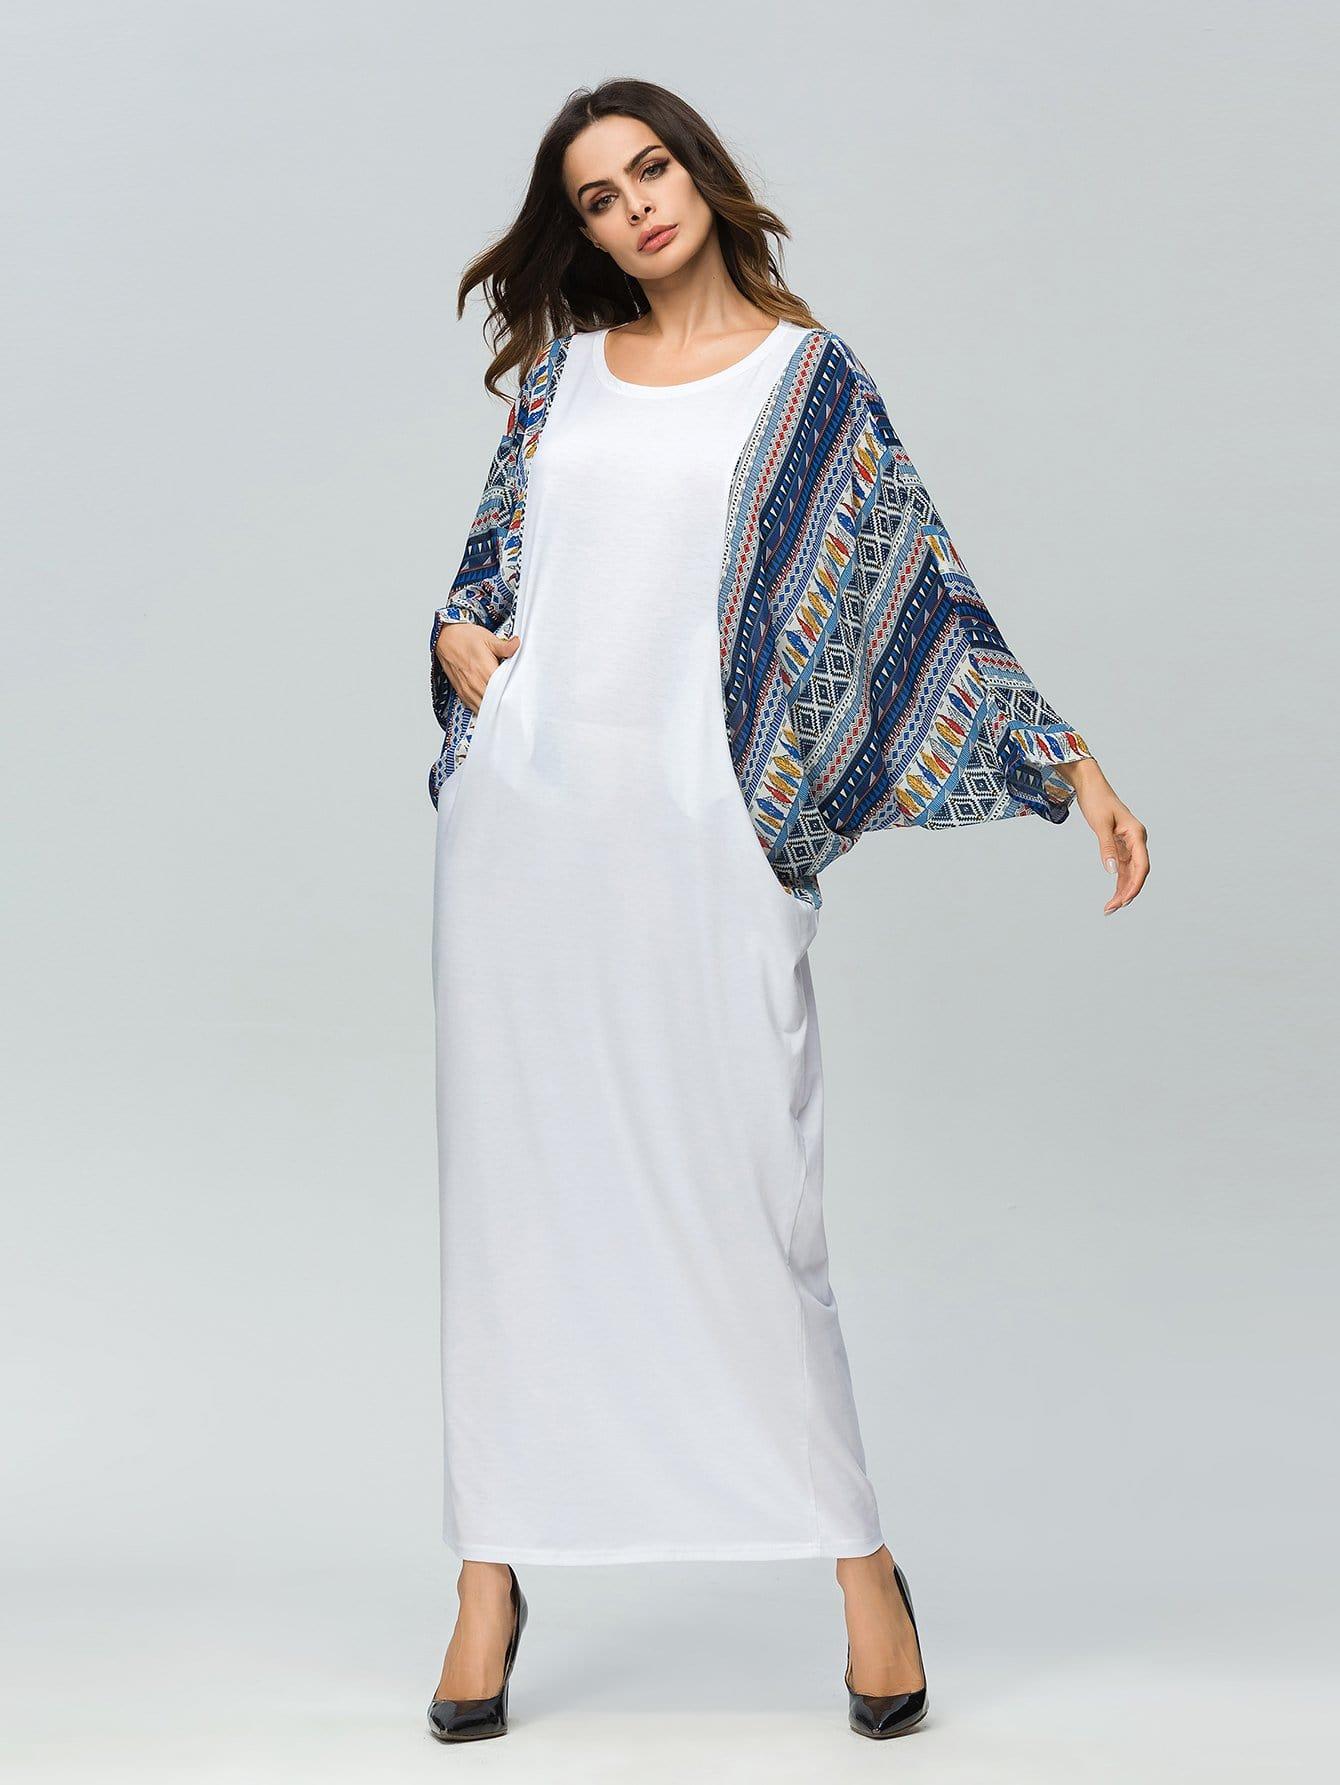 Geometrical Print Batwing Sleeve Longline Dress landscape print longline dress